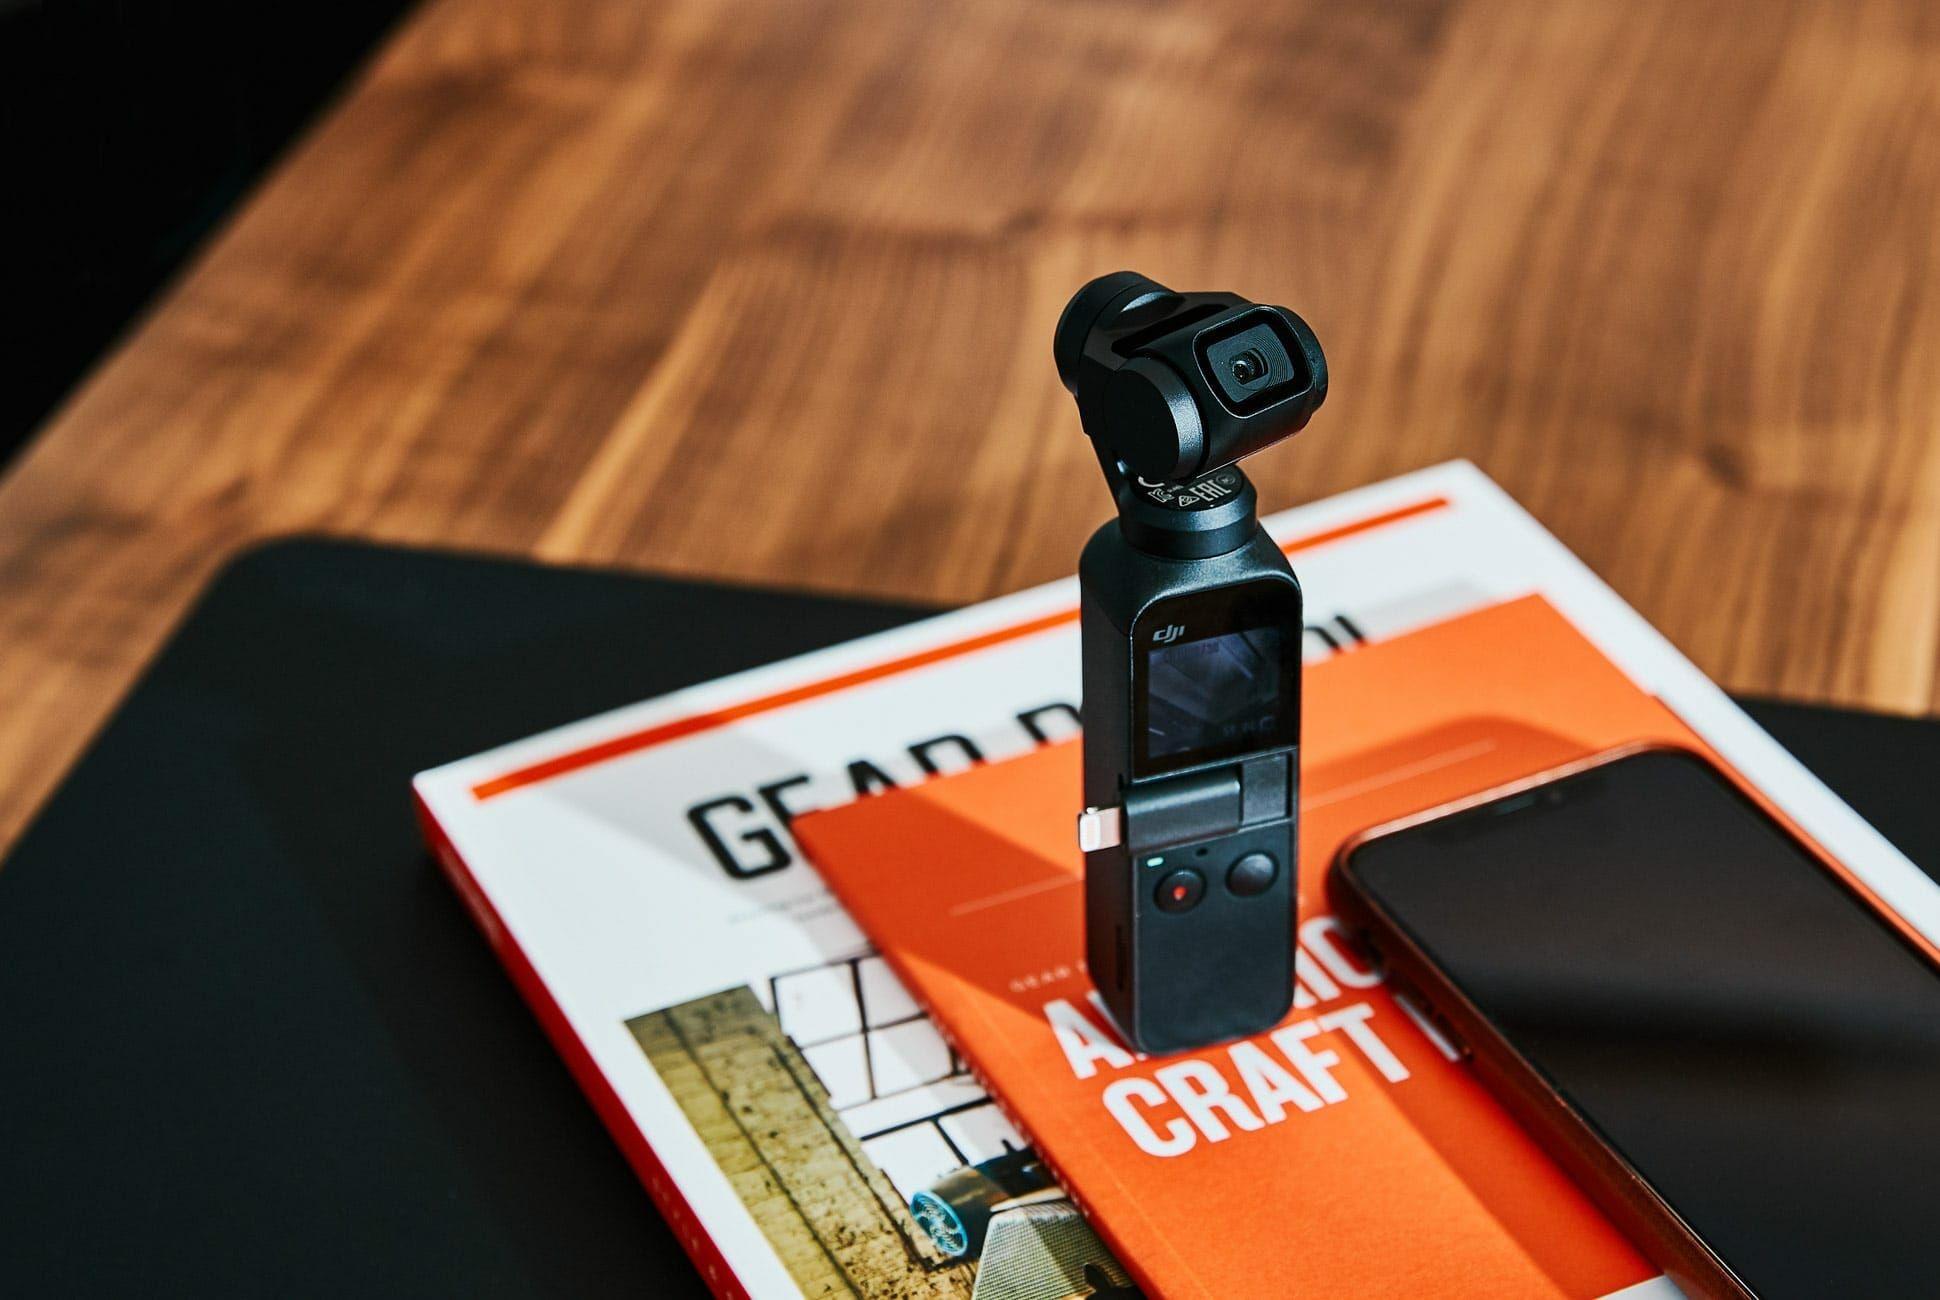 DJI-Osmo-Pocket-HP-Gear-Patrol-Slide-1